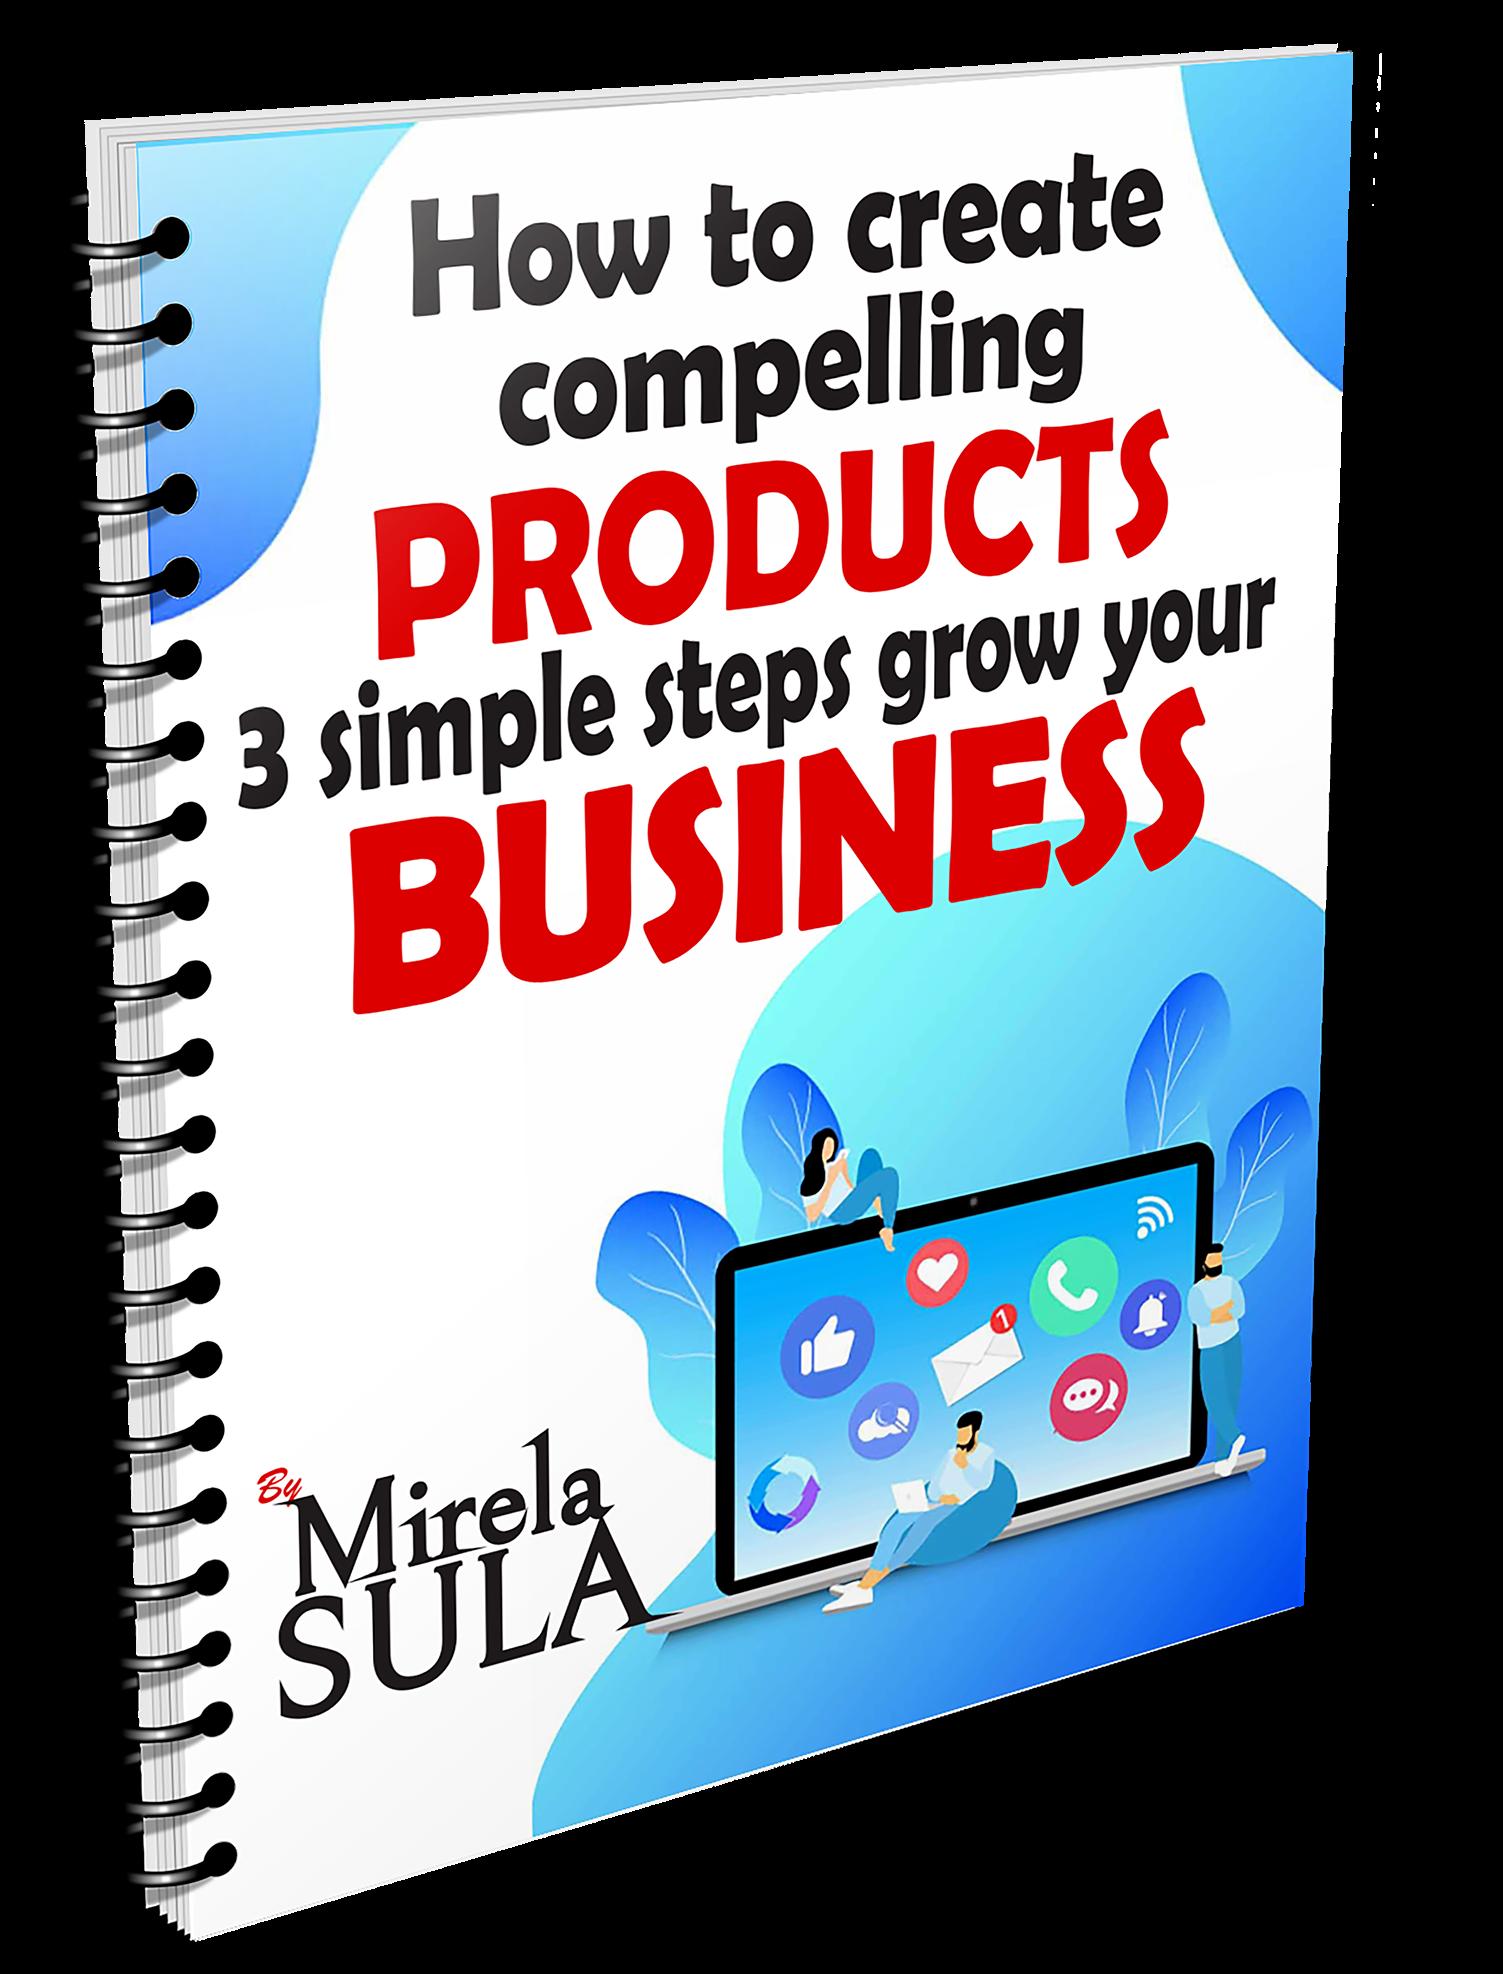 http://mirelasula.com/wp-content/uploads/2021/03/book-3-1.png